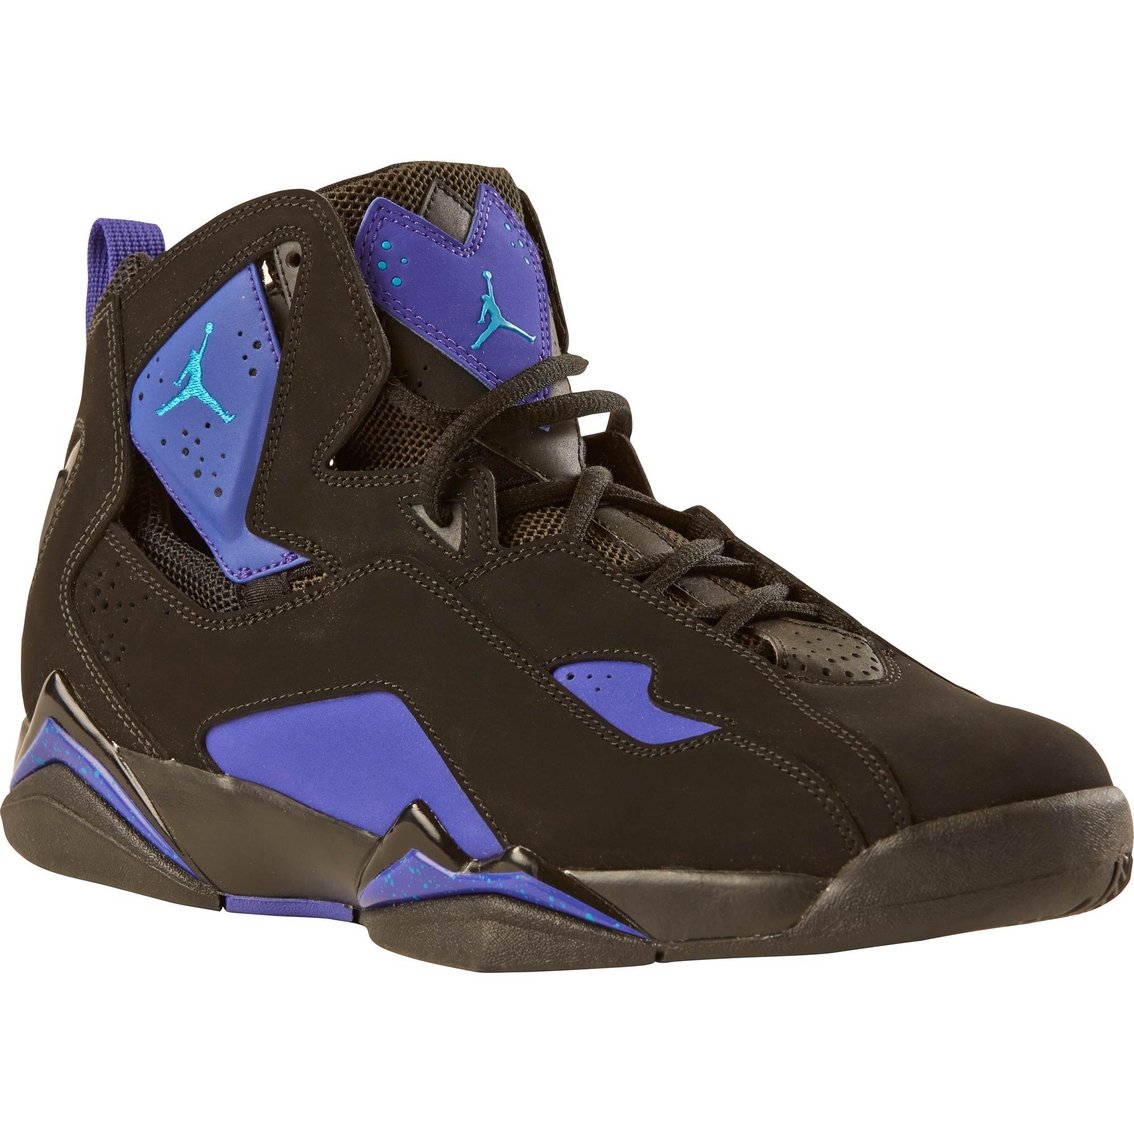 e2ce255154e67f Jordan Men s True Flight Men s Basketball Shoes